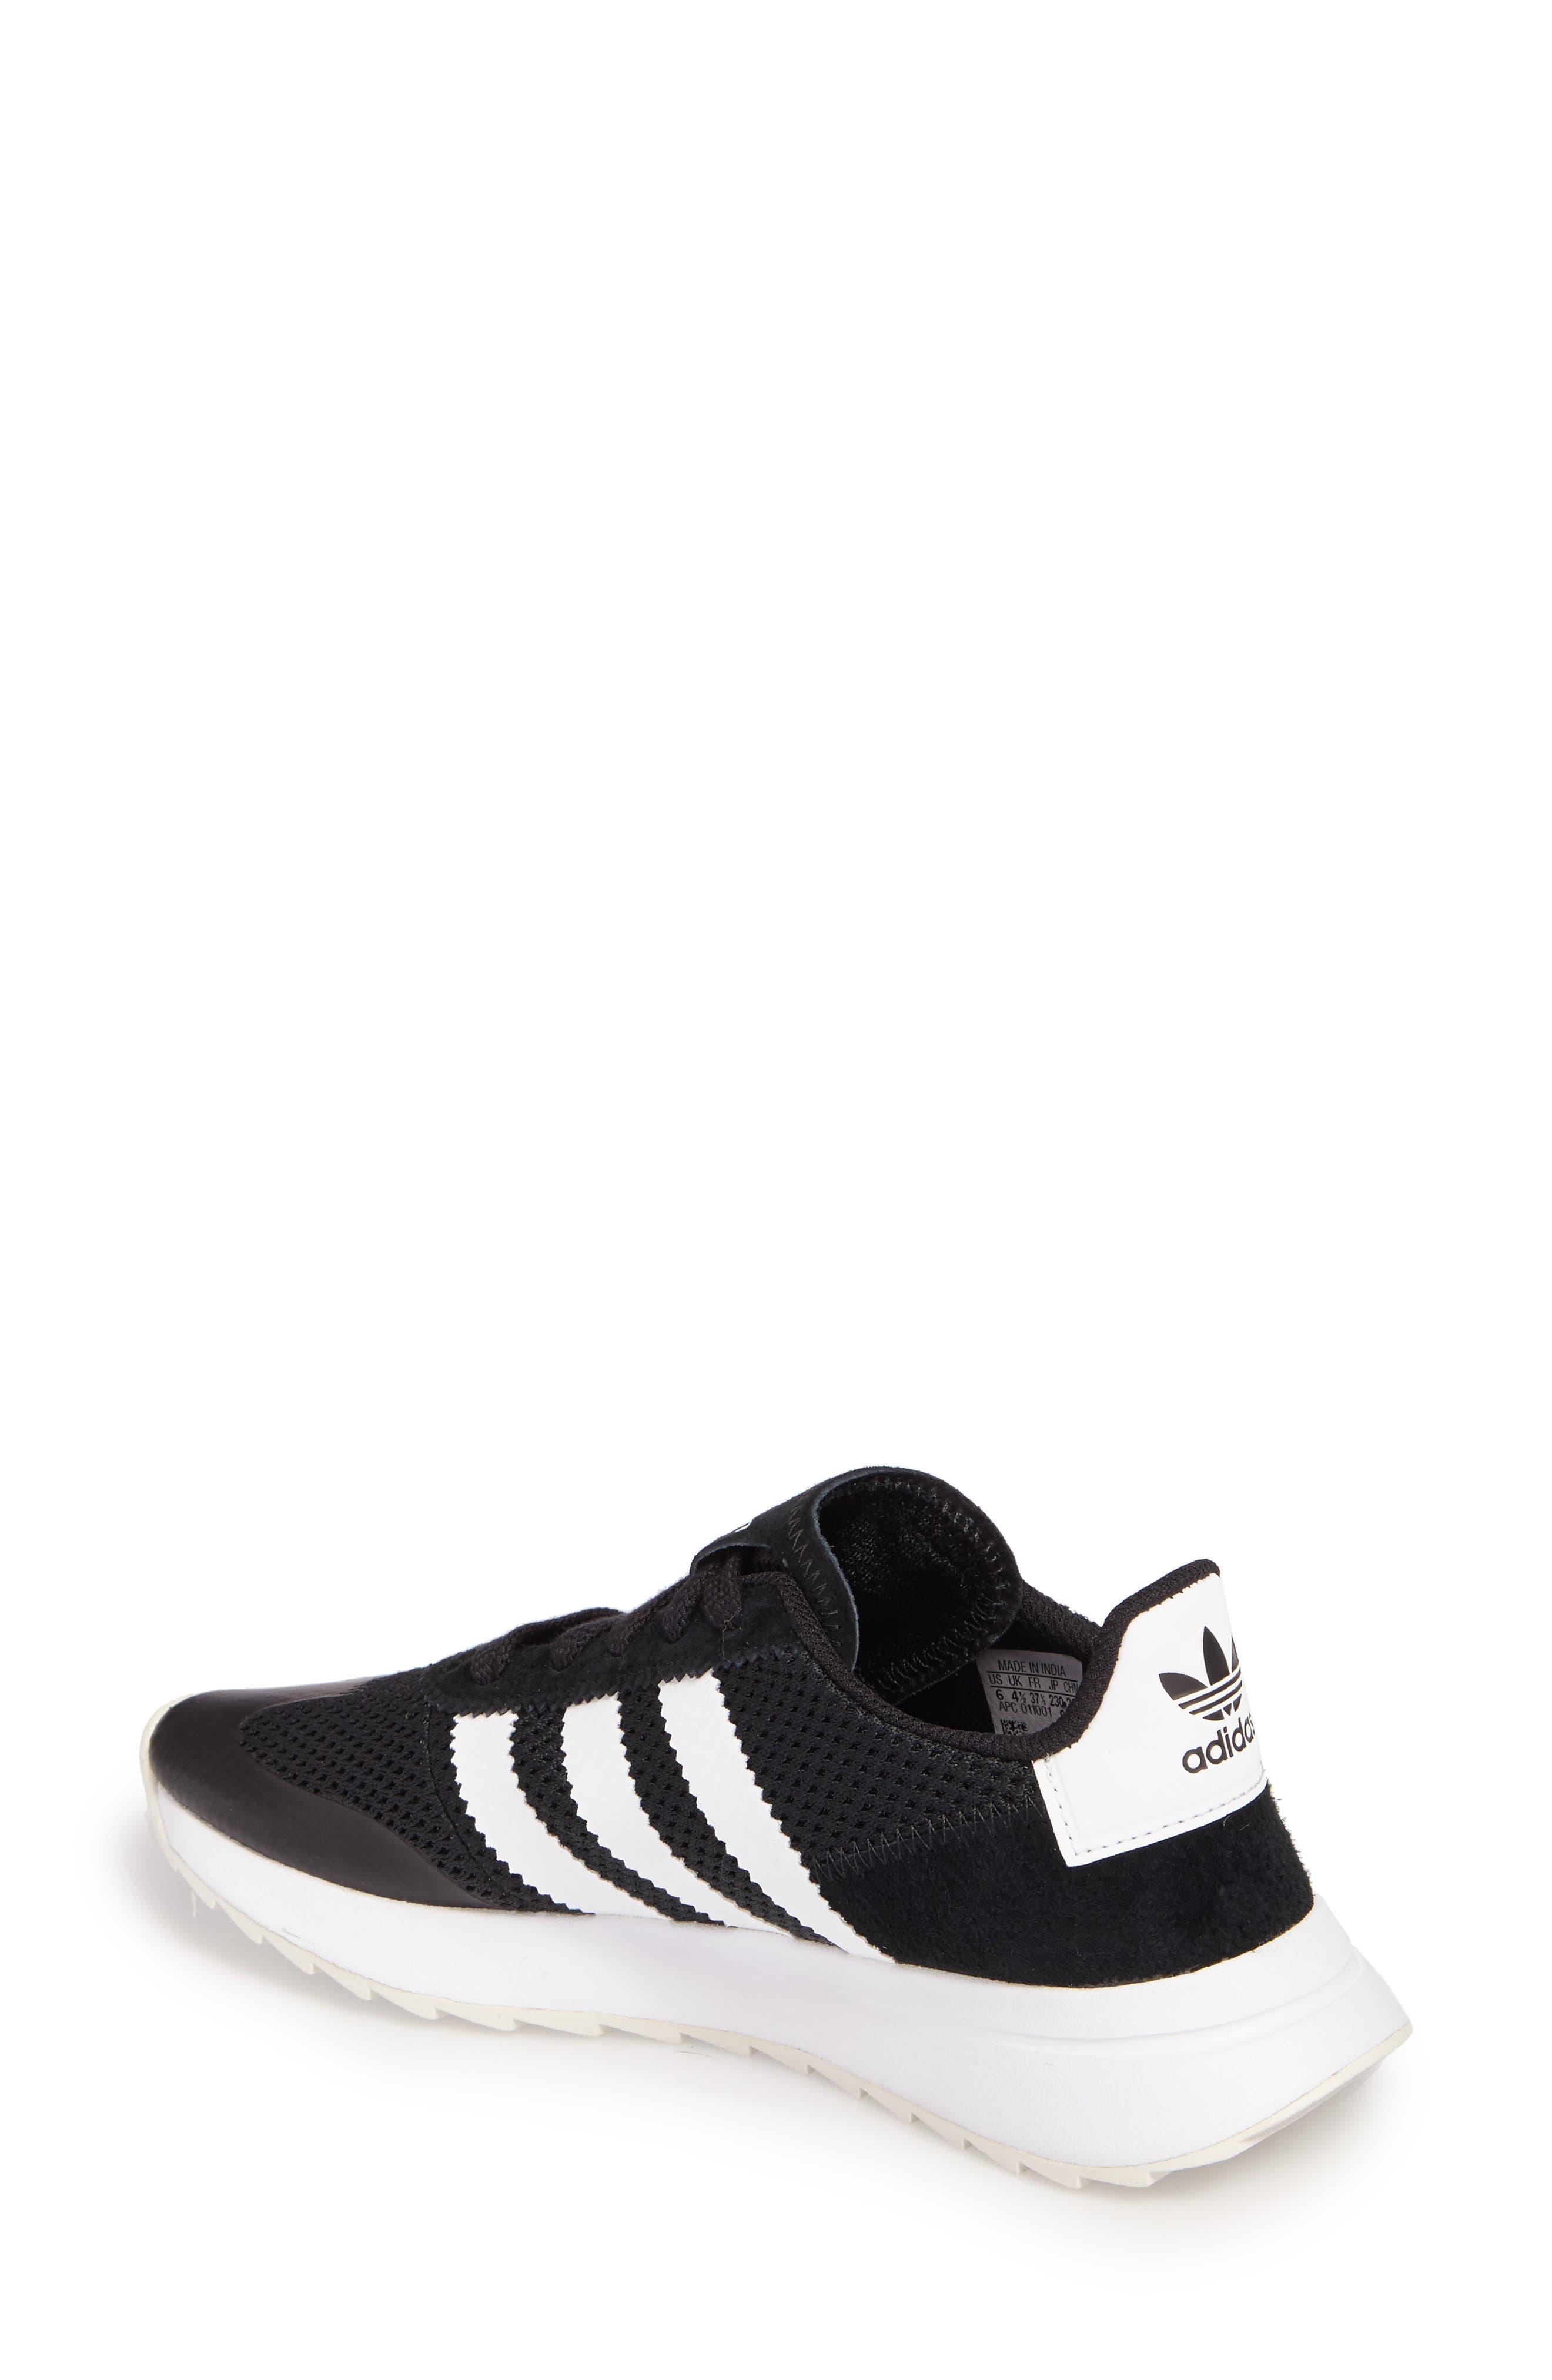 ADIDAS, Flashback Sneaker, Alternate thumbnail 2, color, 001